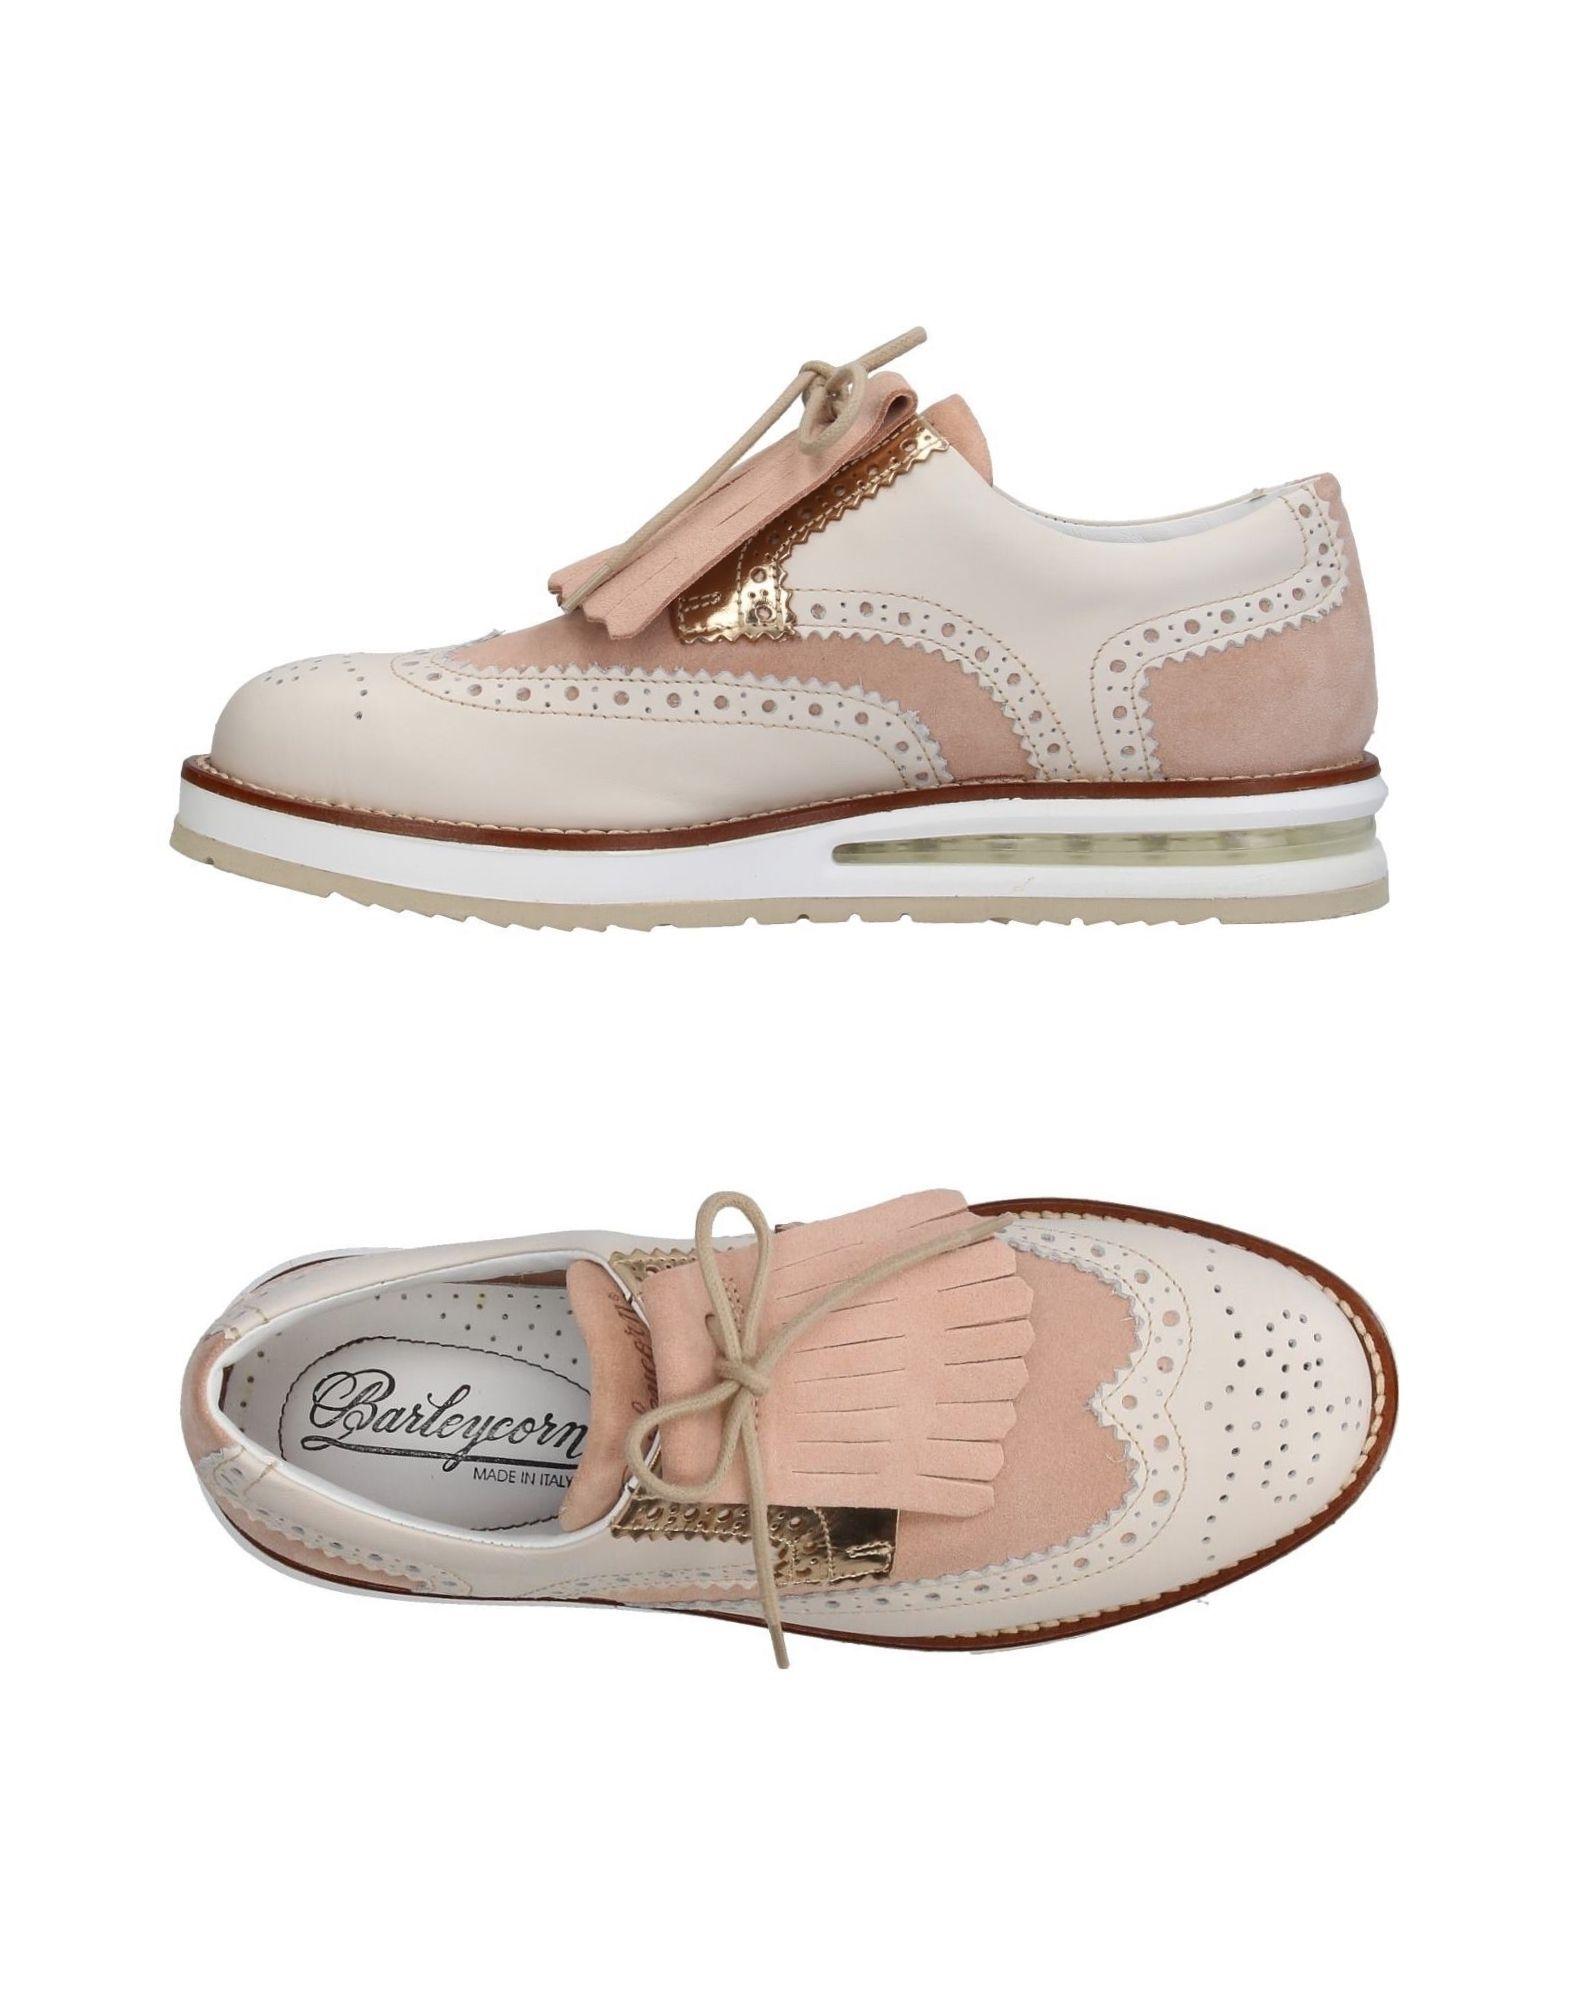 BARLEYCORN Chaussures à lacets femme.  38 EU EU Steve Madden Rhondaa-Blk Size 8.5us  Bottes pour Femme - beige - Nepal Champagne  38 EU wVfTb